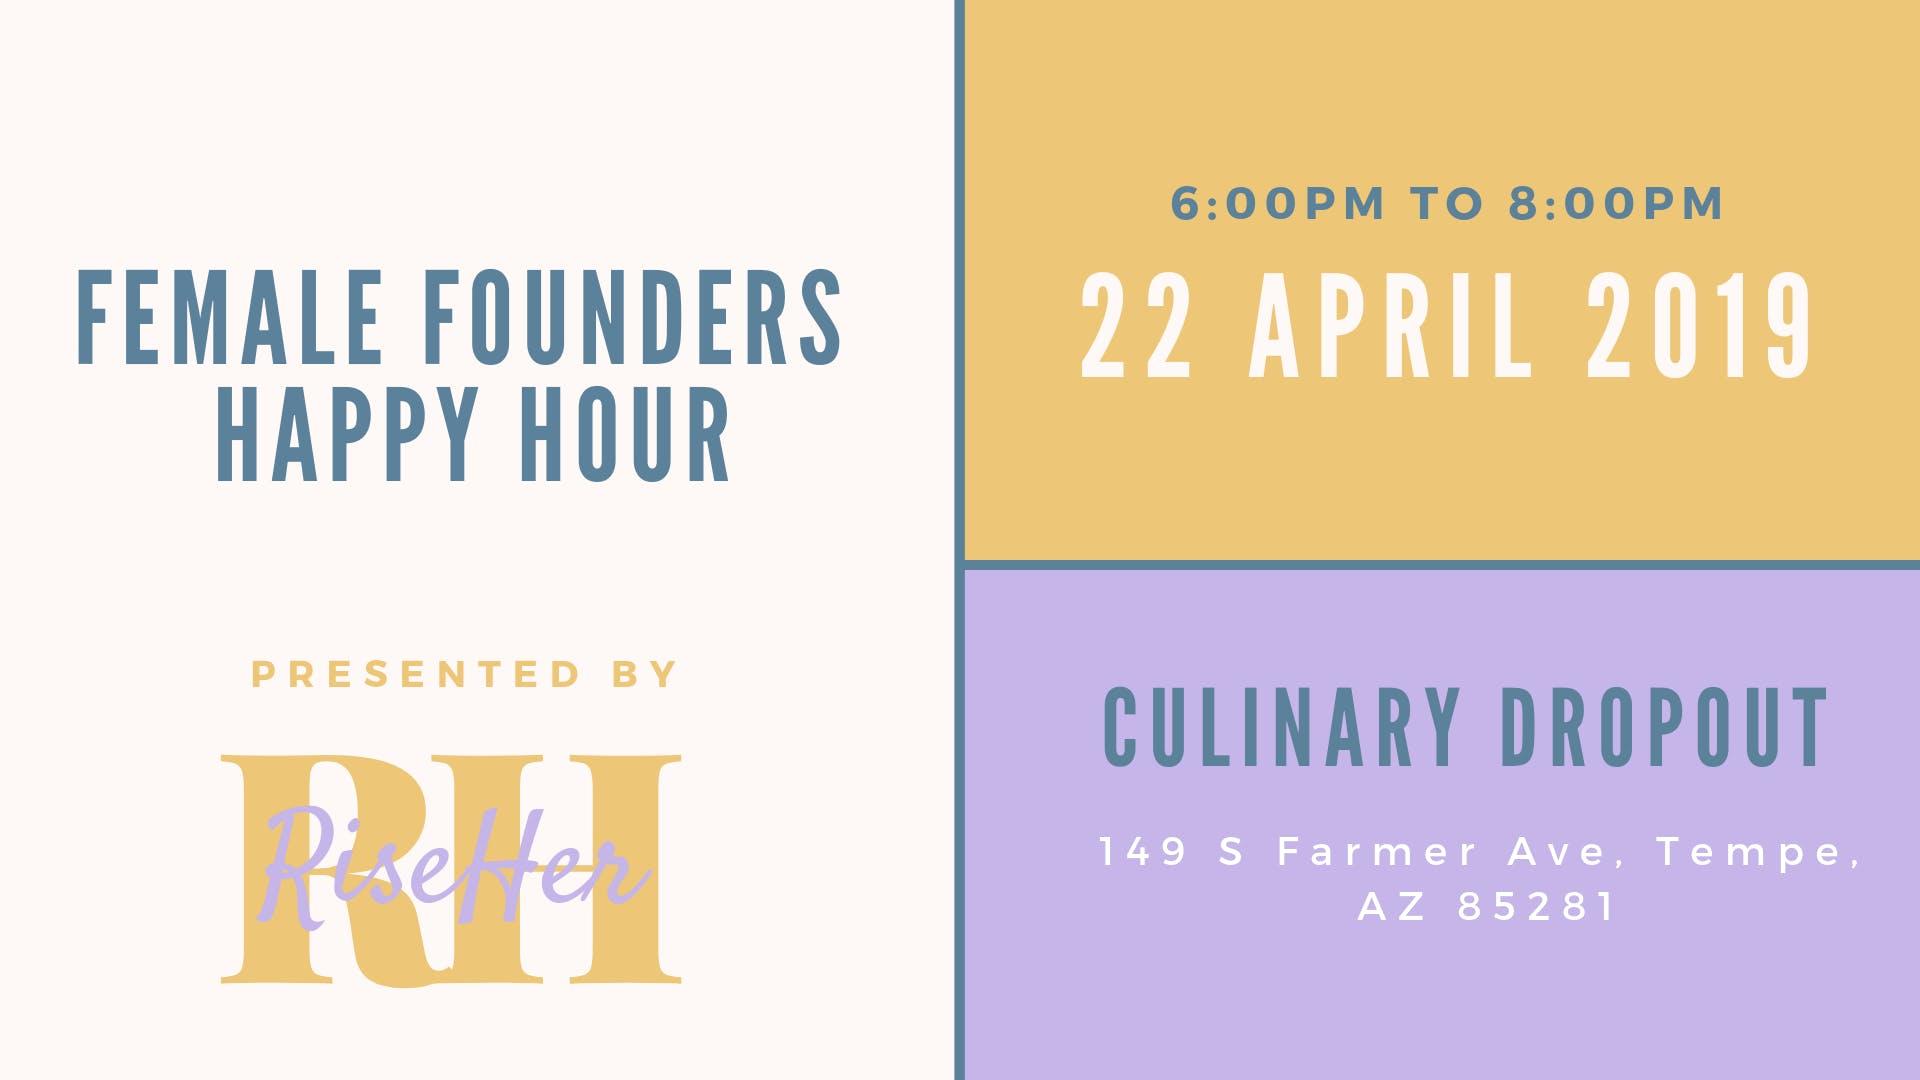 Female Founders Happy Hour - Arizona